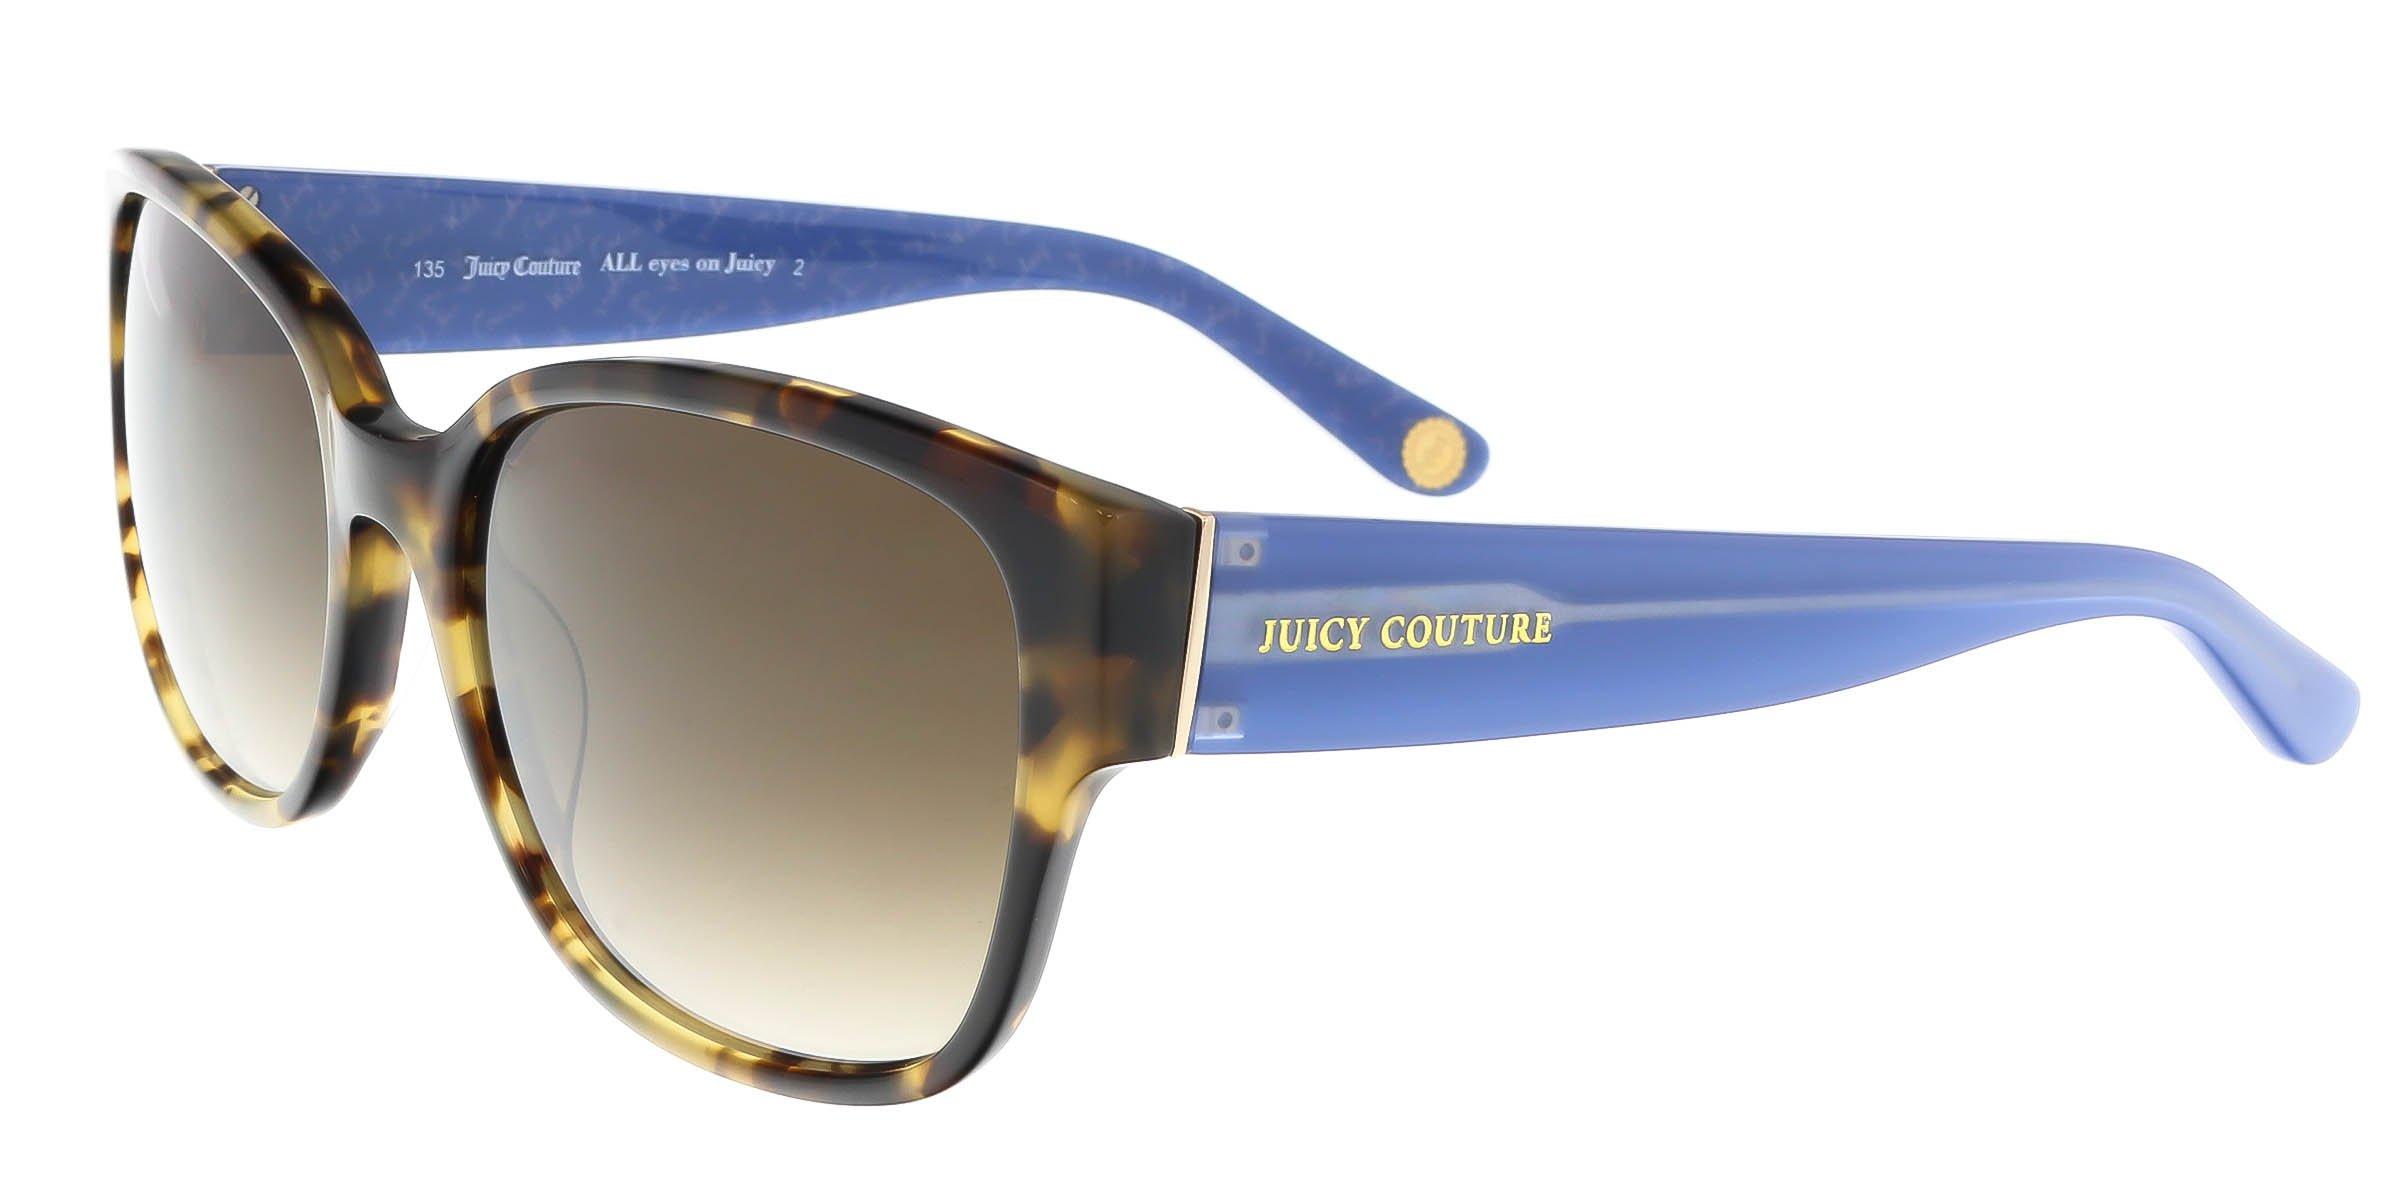 Juicy Couture W-SG-3000 Juicy Couture Juicy 573-S 0ESP-Camel Tortoise Womens Sunglasses, 57-18-135 mm